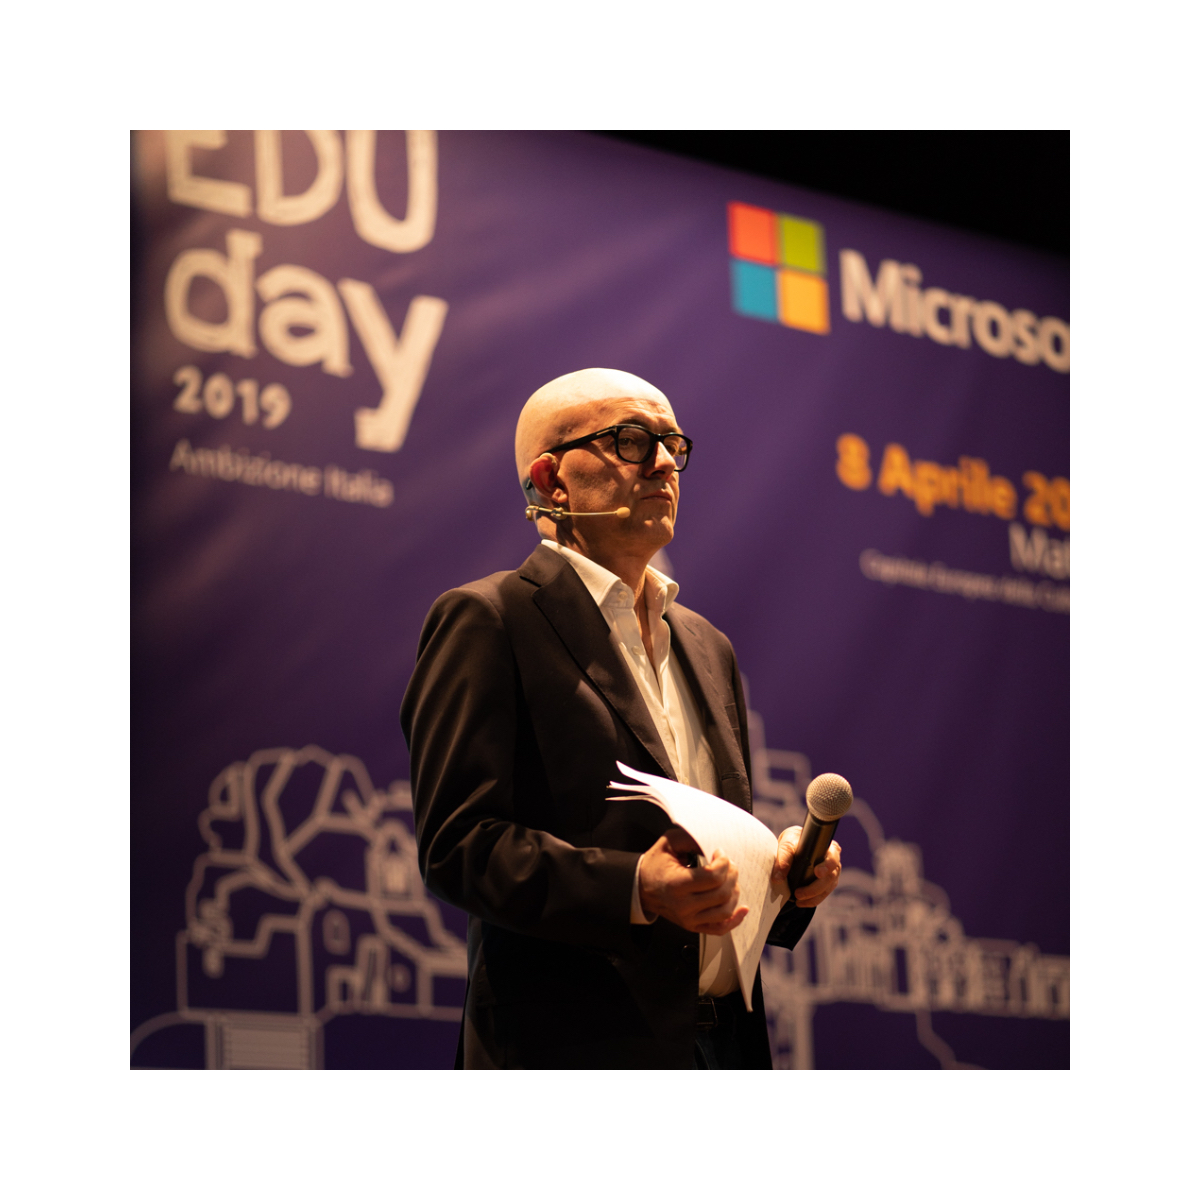 Microsoft Edu Day Luca Viscardi